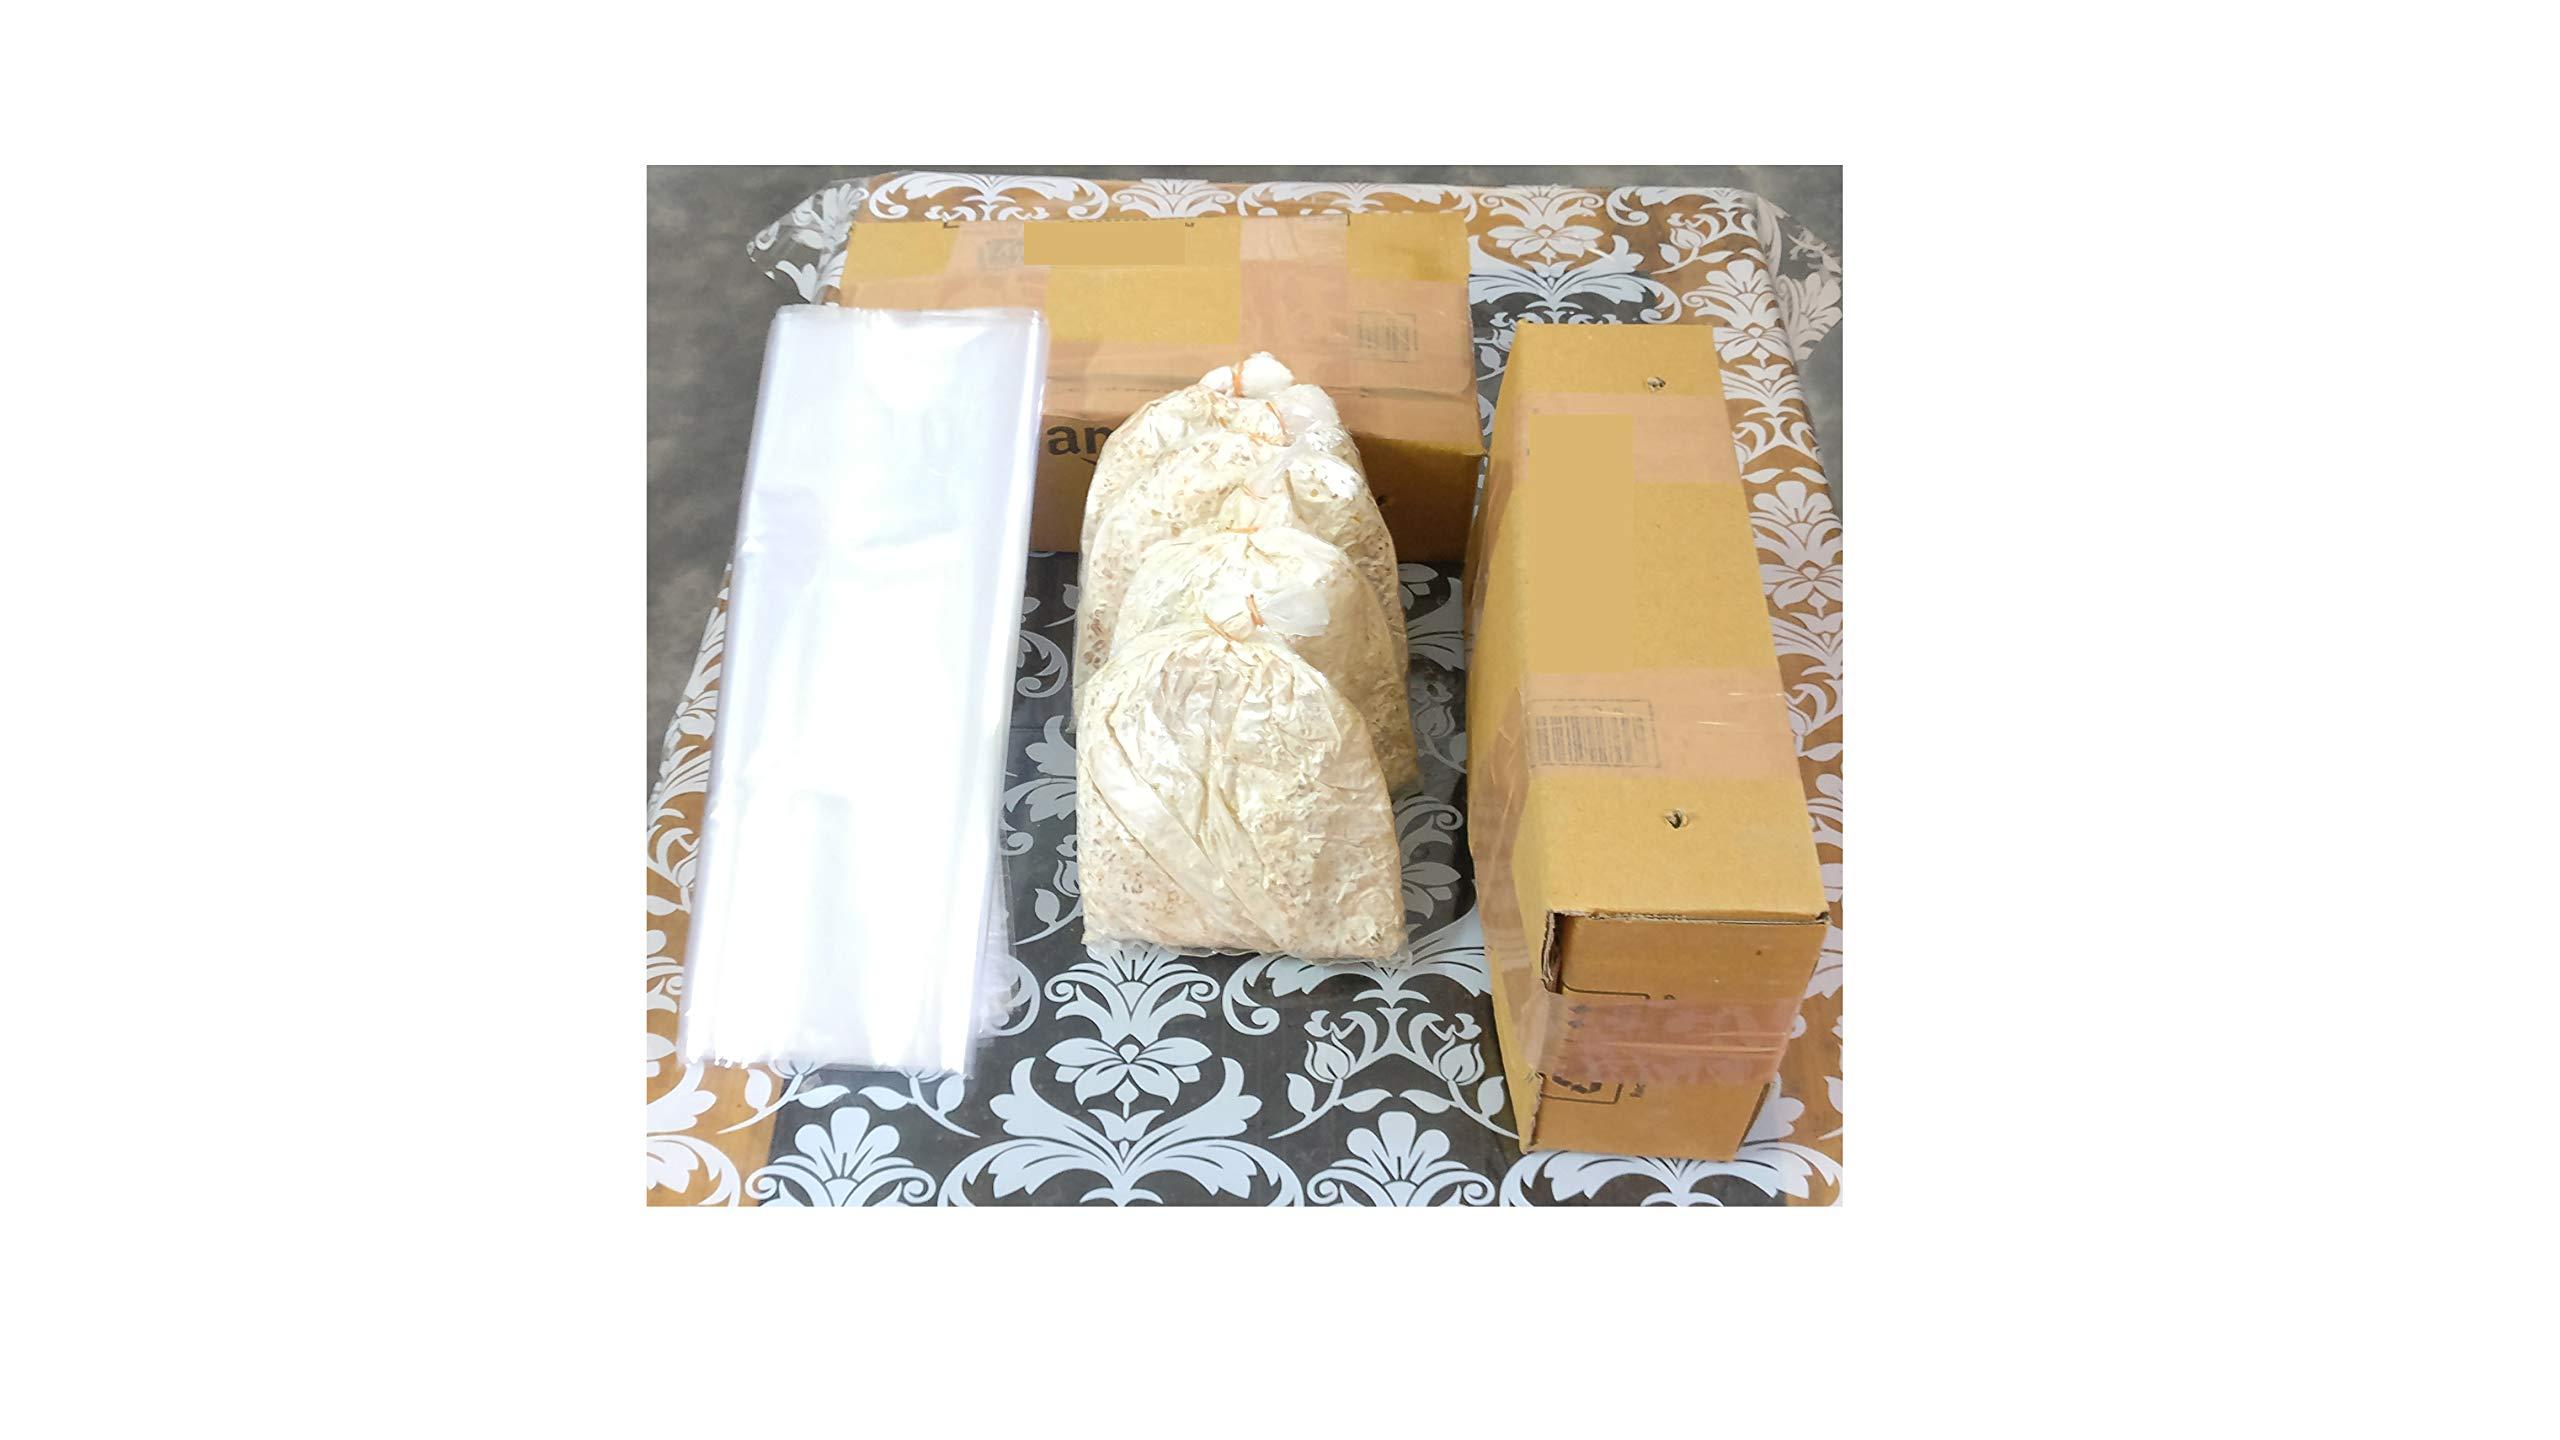 BM MUSHROOM Florida Oyster Spawn, 1kg Plus 5 PP Bags